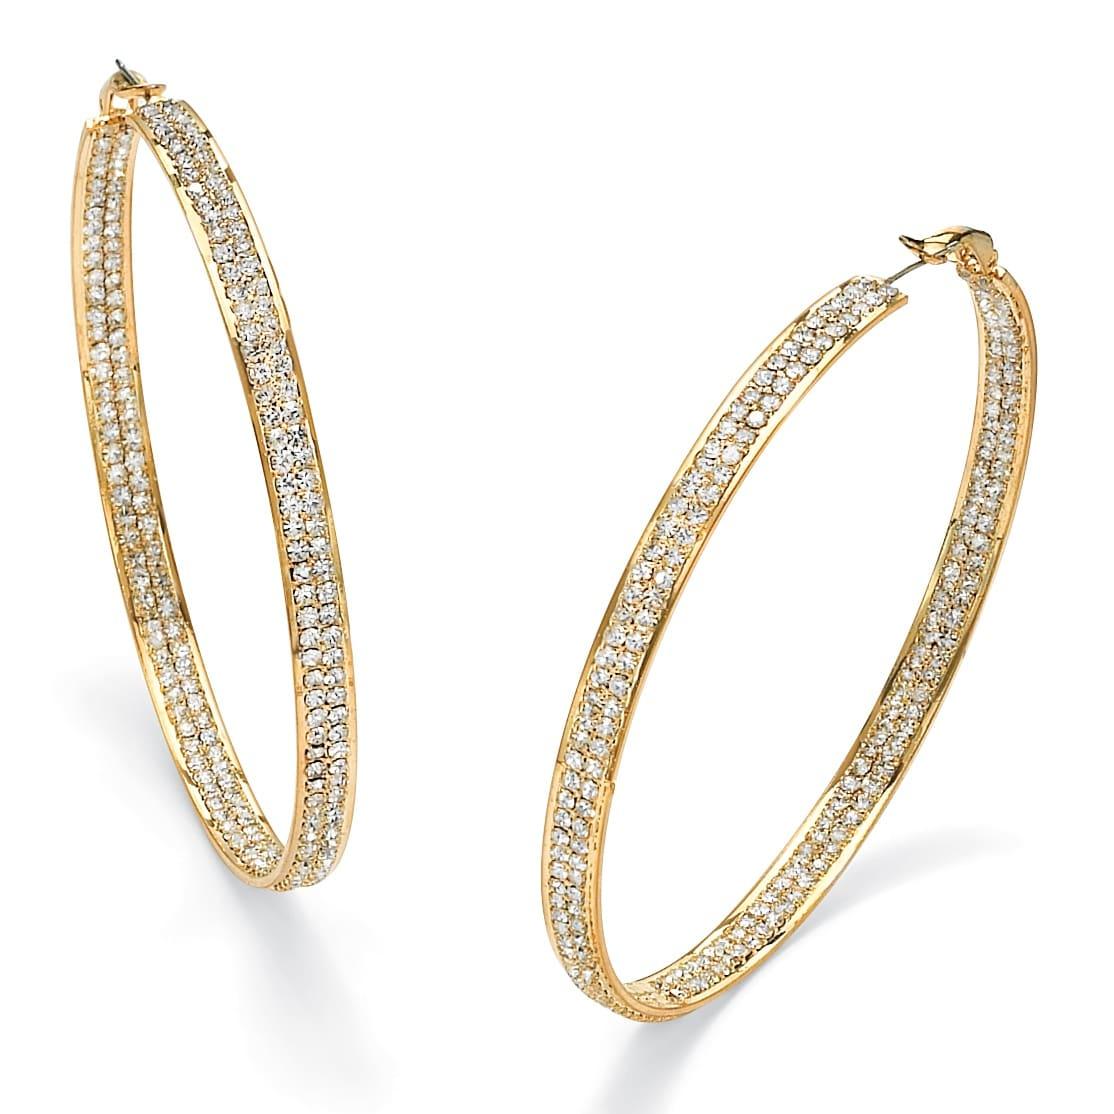 PalmBeach Jewelry Yellow Goldtone Cubic Zirconia Crystal Hoop Earrings Bold Fashion